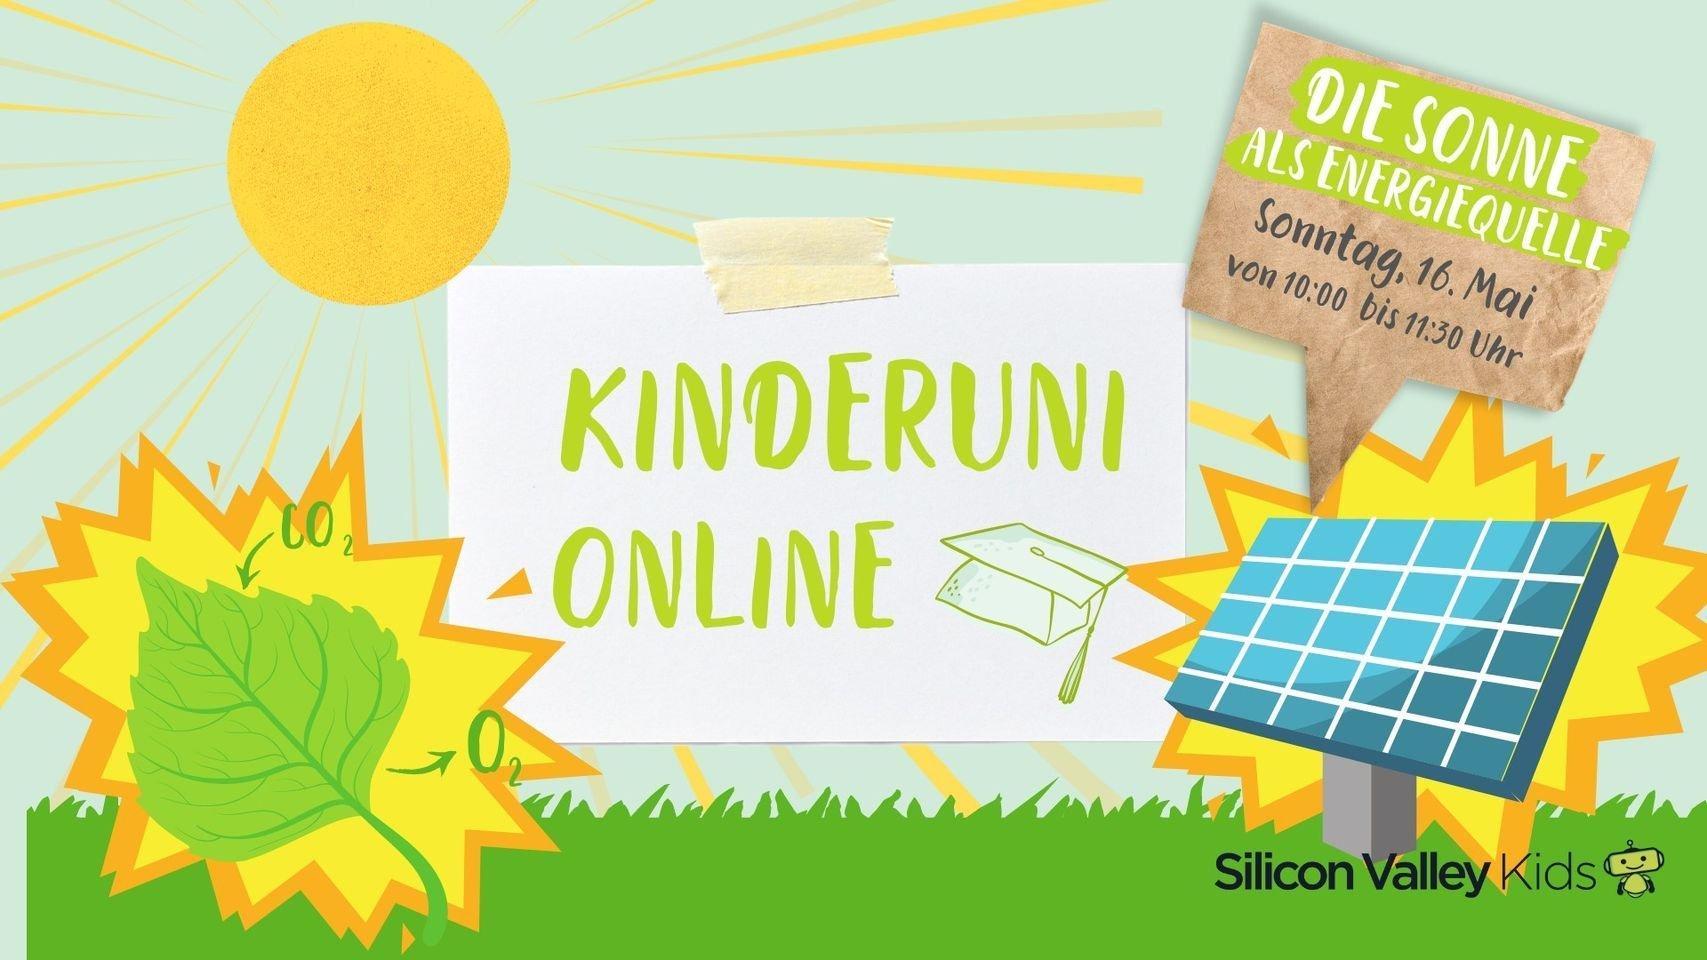 Kinder UNI | The Sun - Source of All Energy